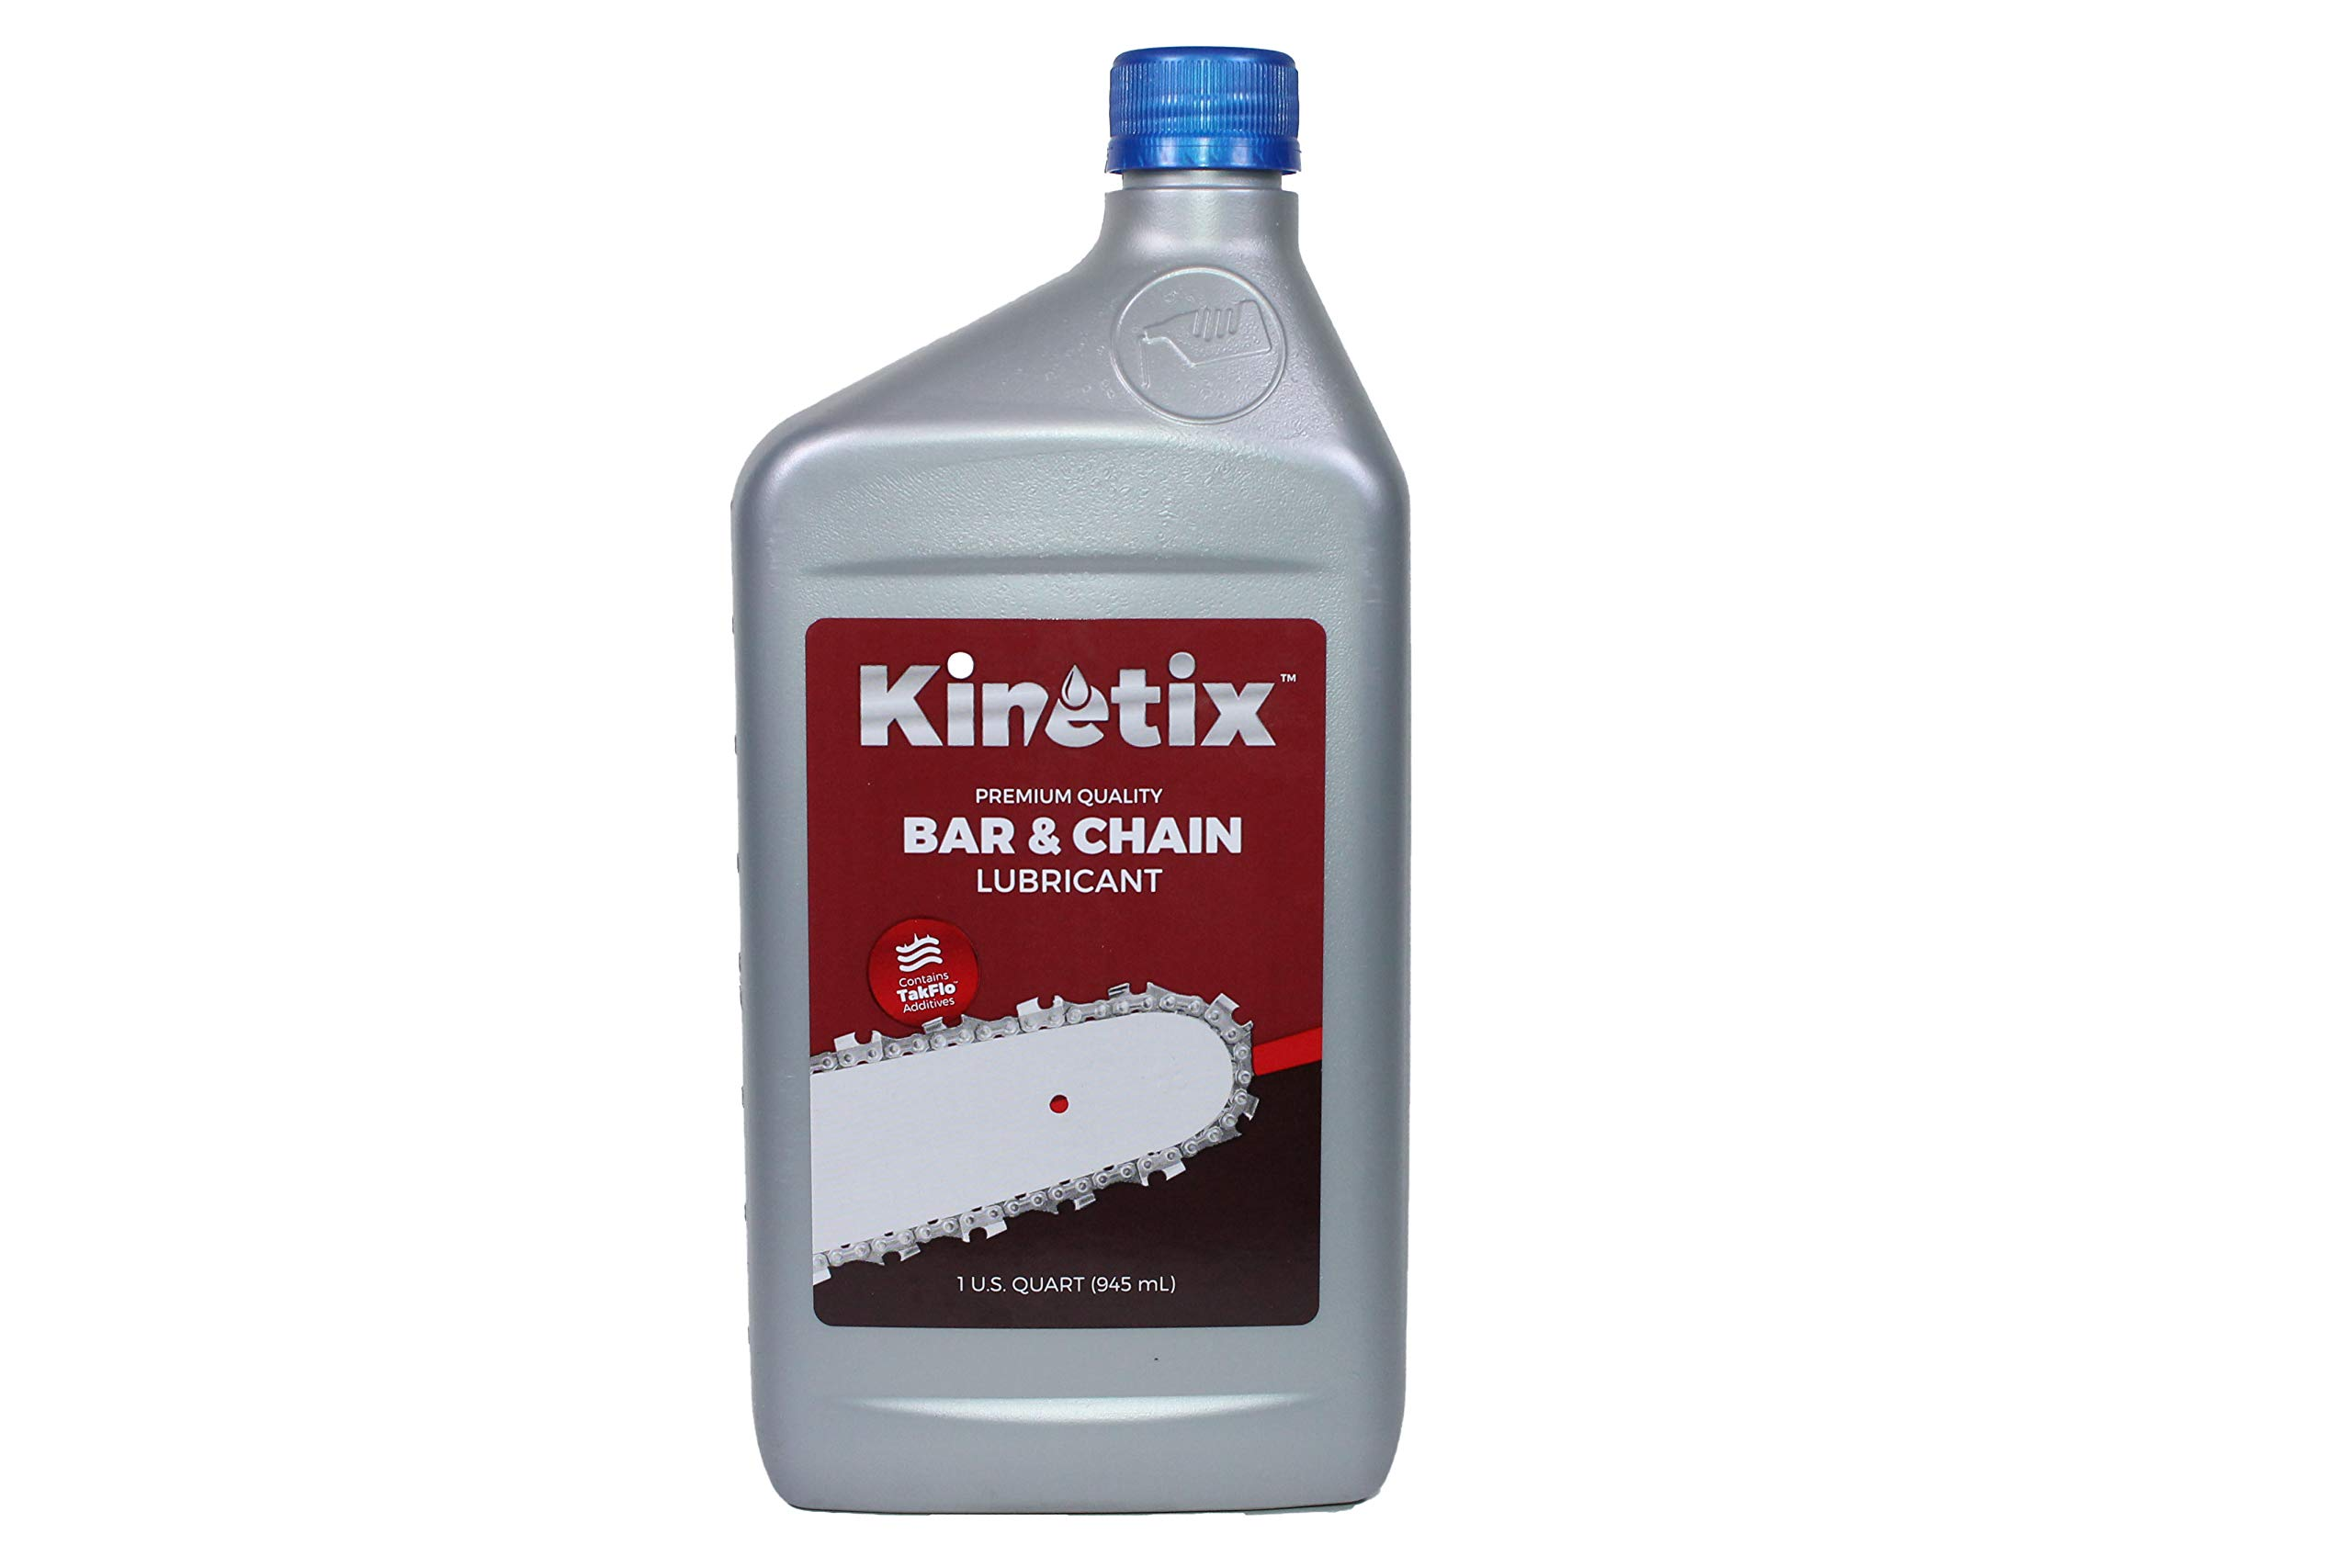 All-Season Bar and Chain Oil (1 Quart) by Kinetix Lubricants